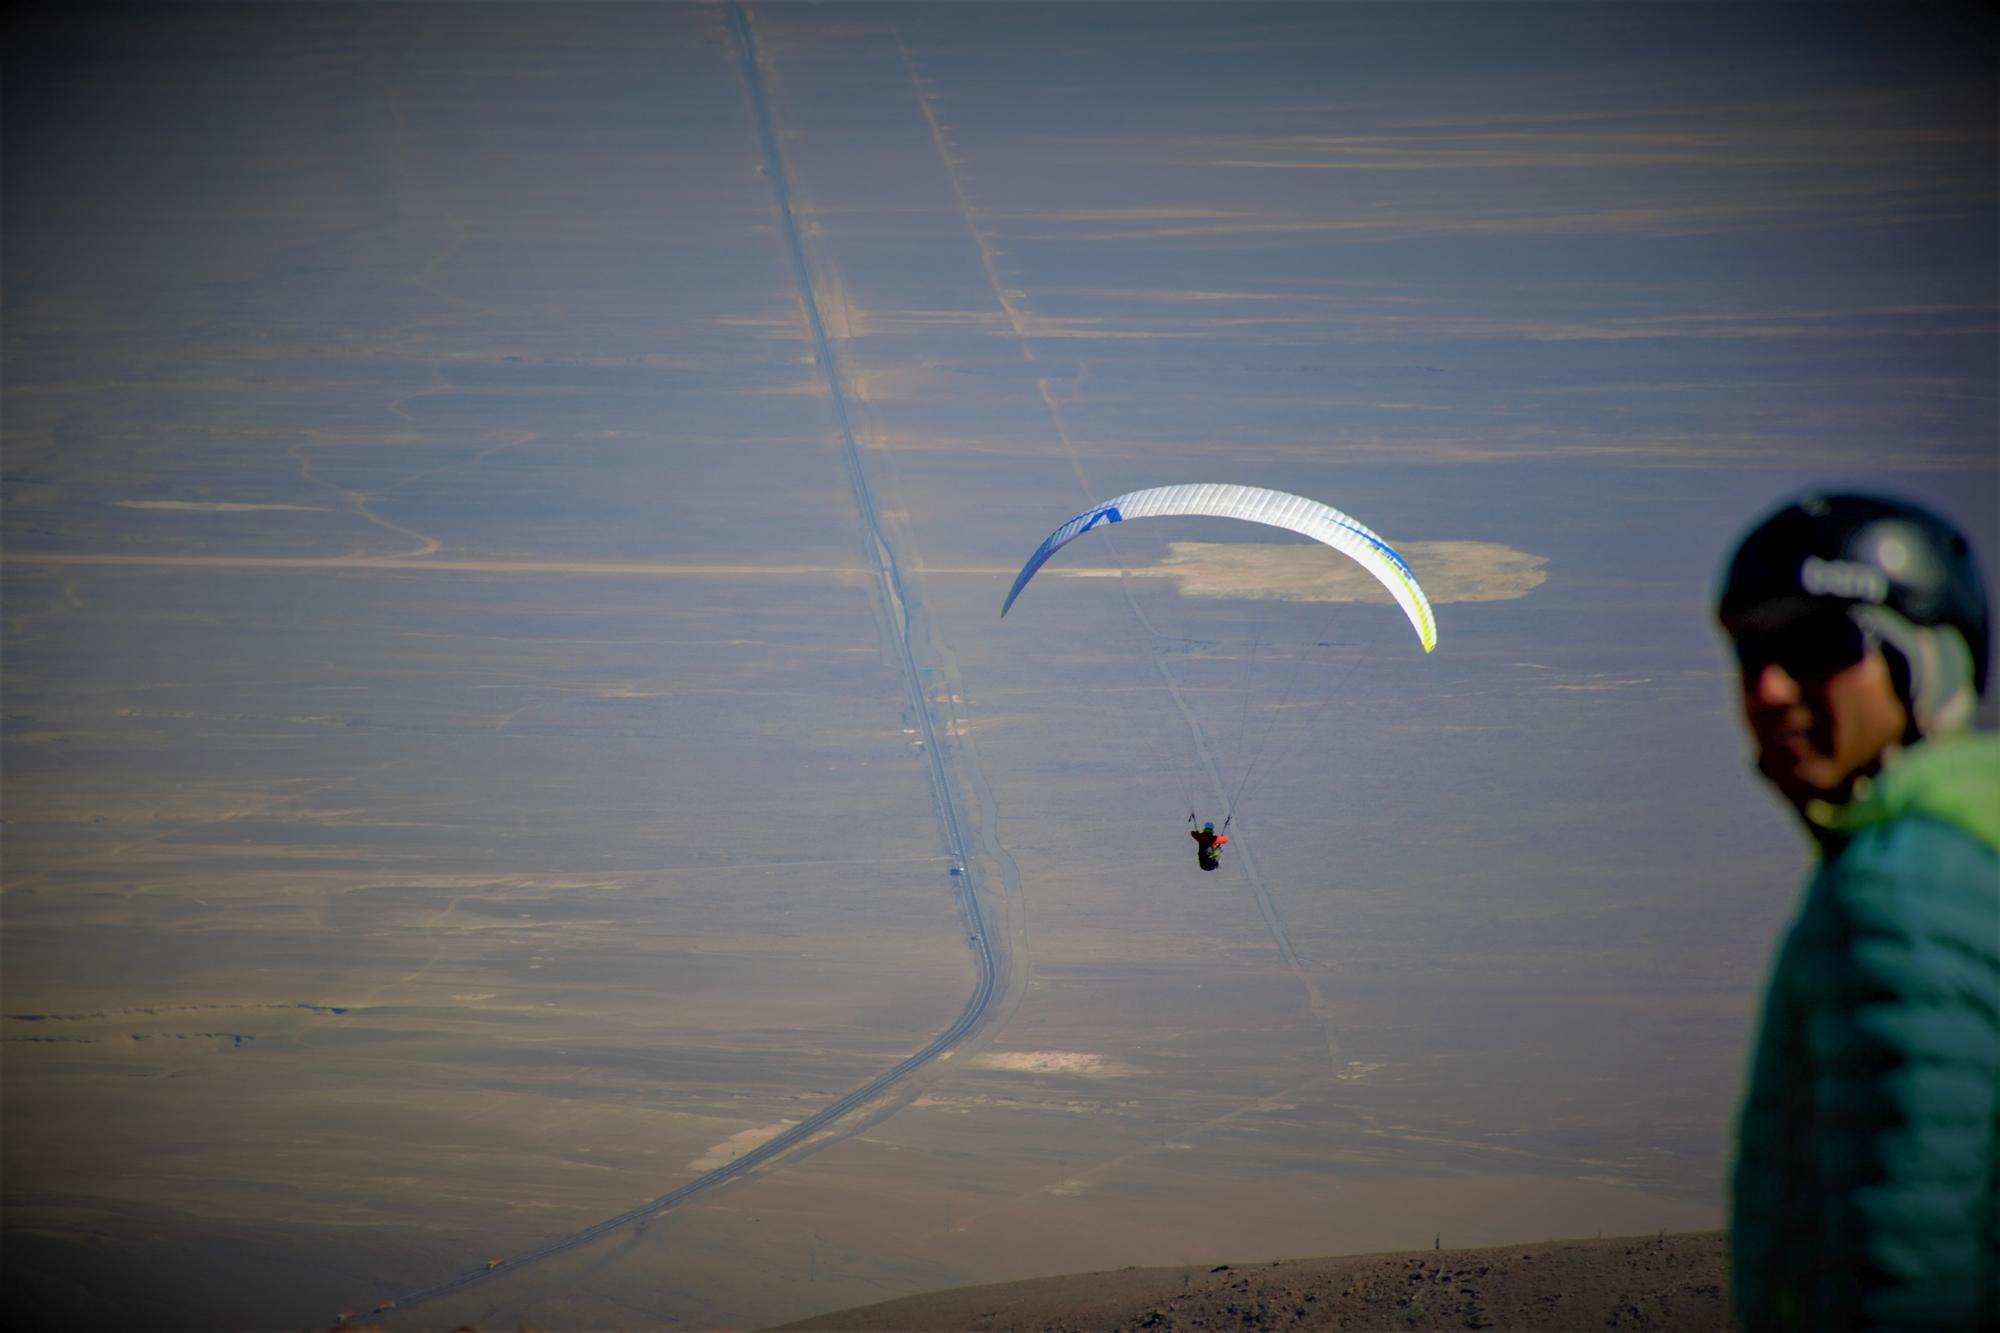 Chile Paragliding  Francois ragolski  Skywalk Syride supair-4